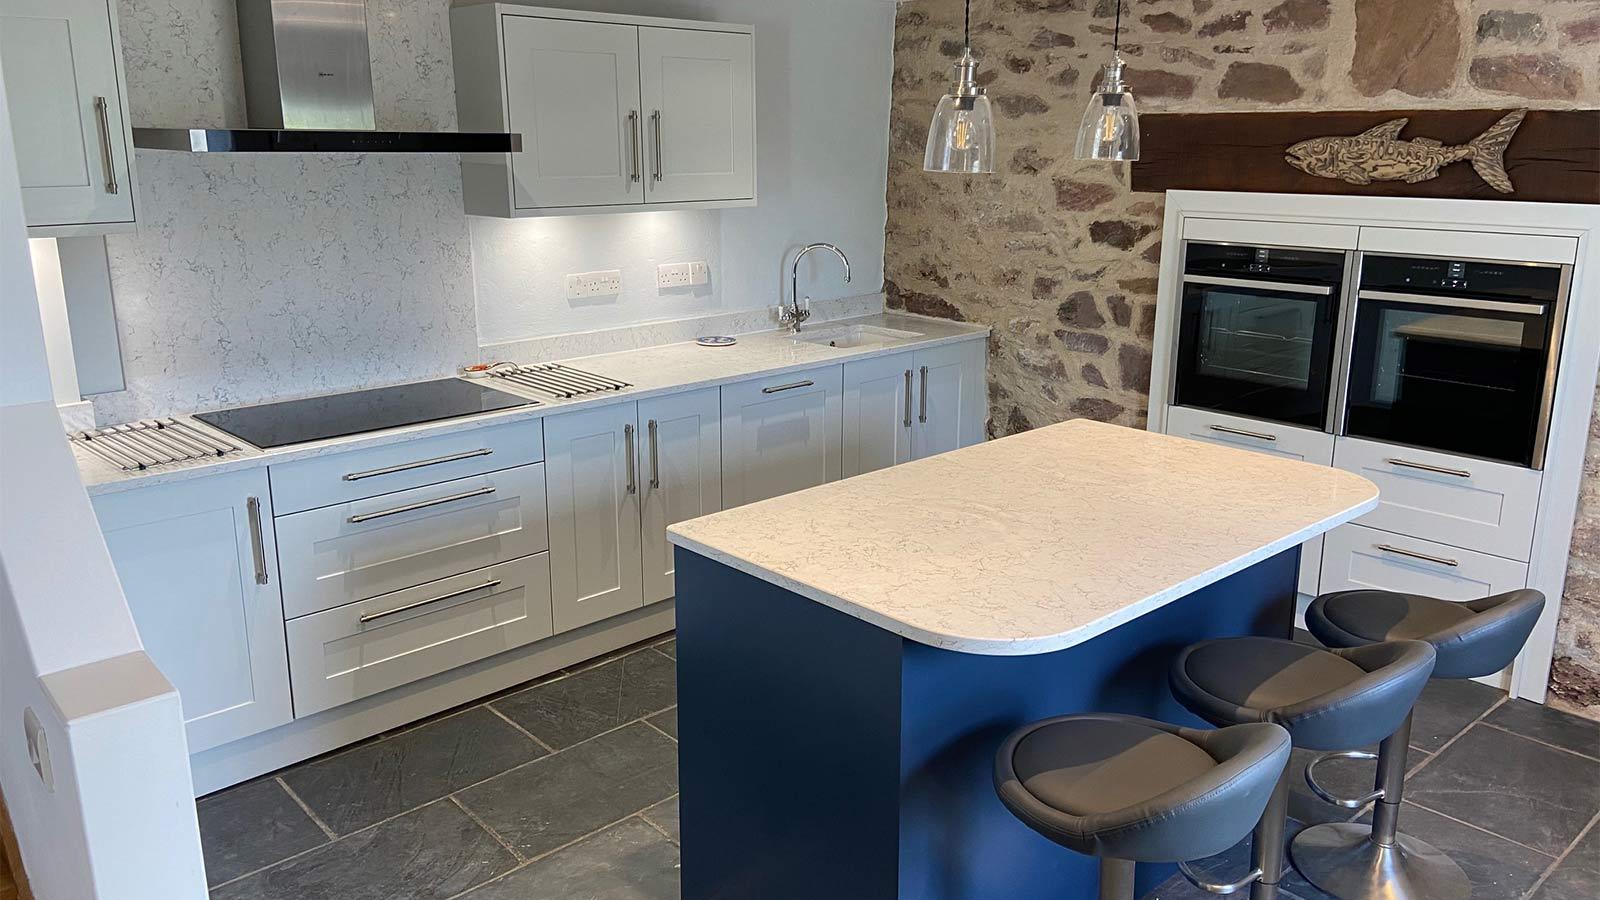 5 Great Ideas For Small Kitchens Kitchen Inspiration Blog Masterclass Kitchens